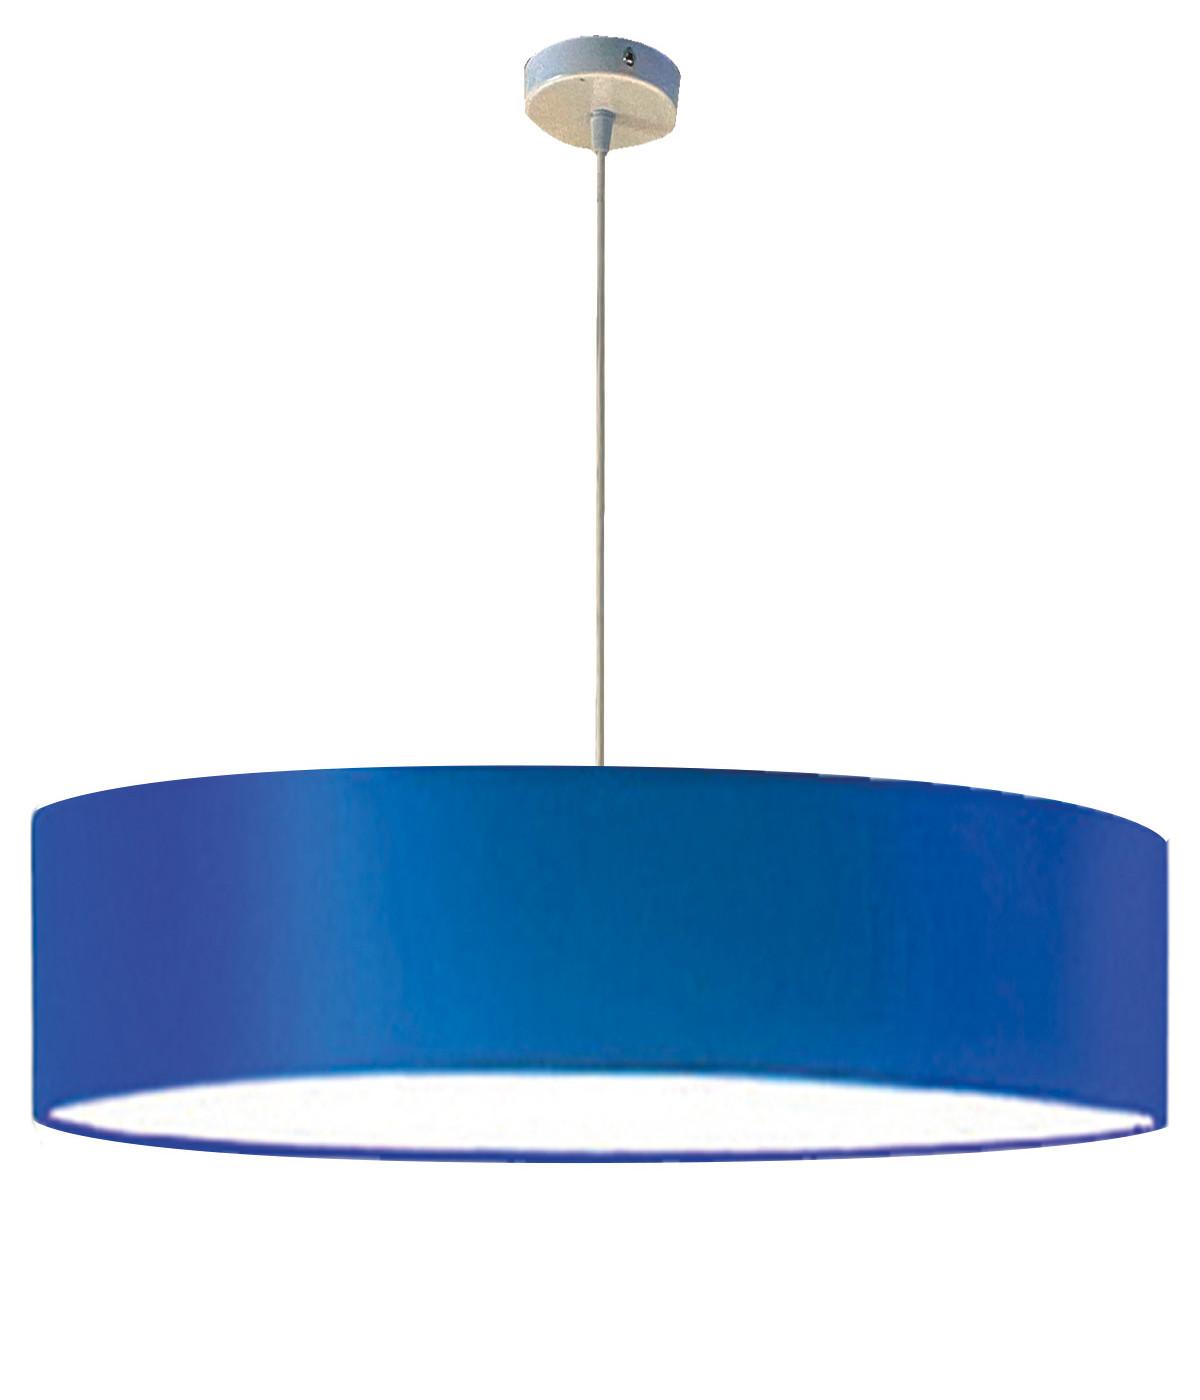 Suspension Stella Bleu D 65 x H 20